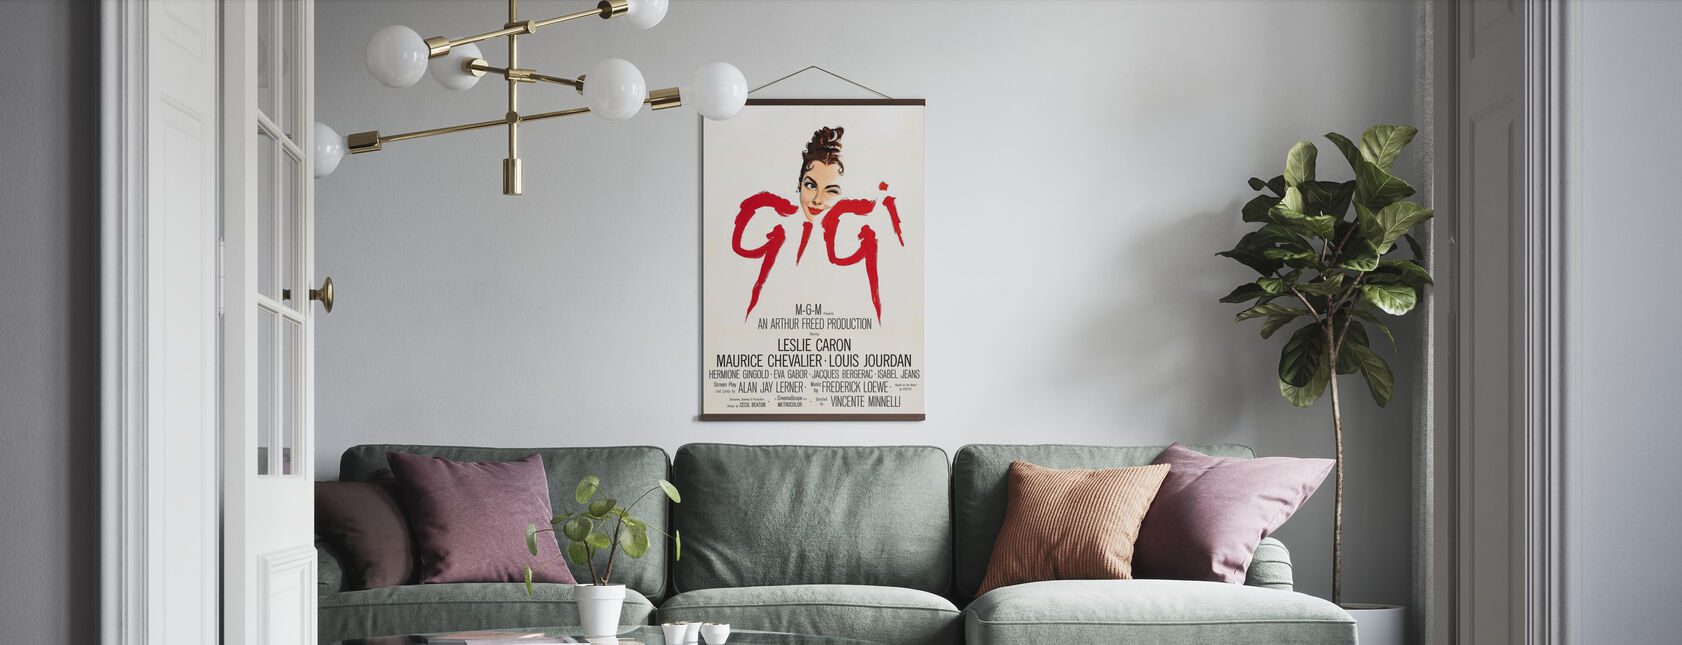 Gigi - Poster - Woonkamer